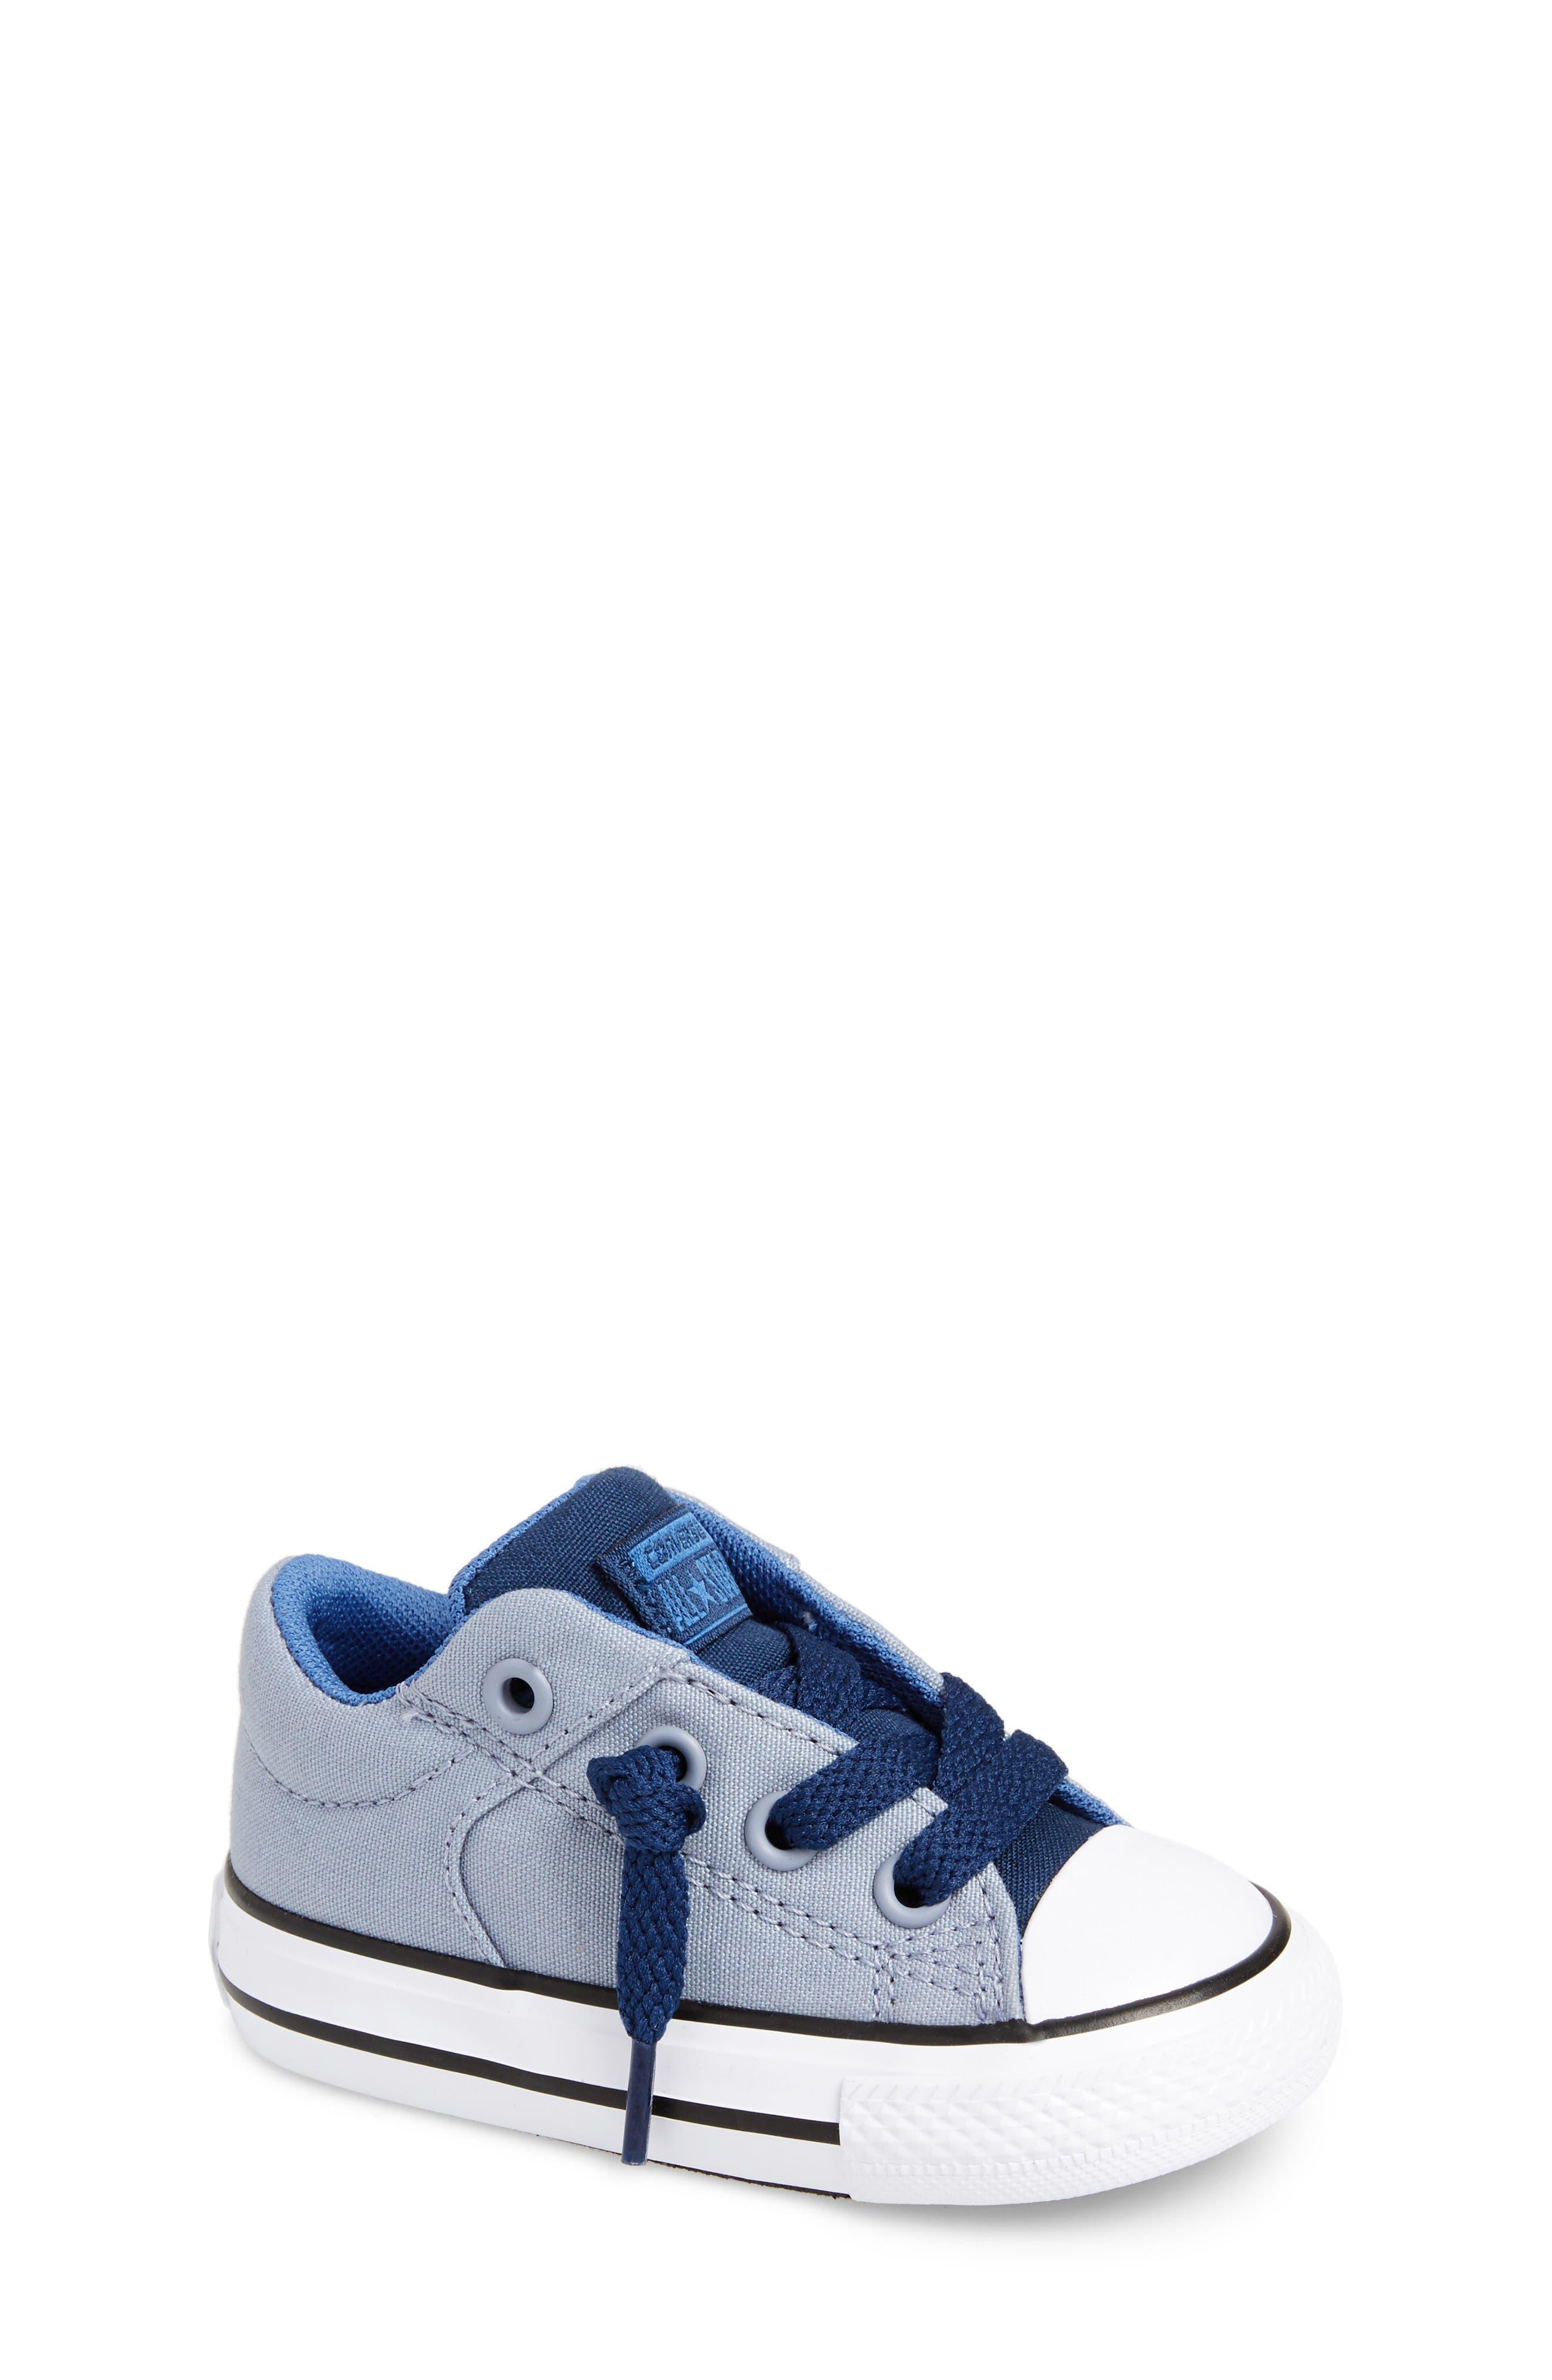 Converse Chuck Taylor® All Star® High Street Slip-On Sneaker (Baby, Walker & Toddler)